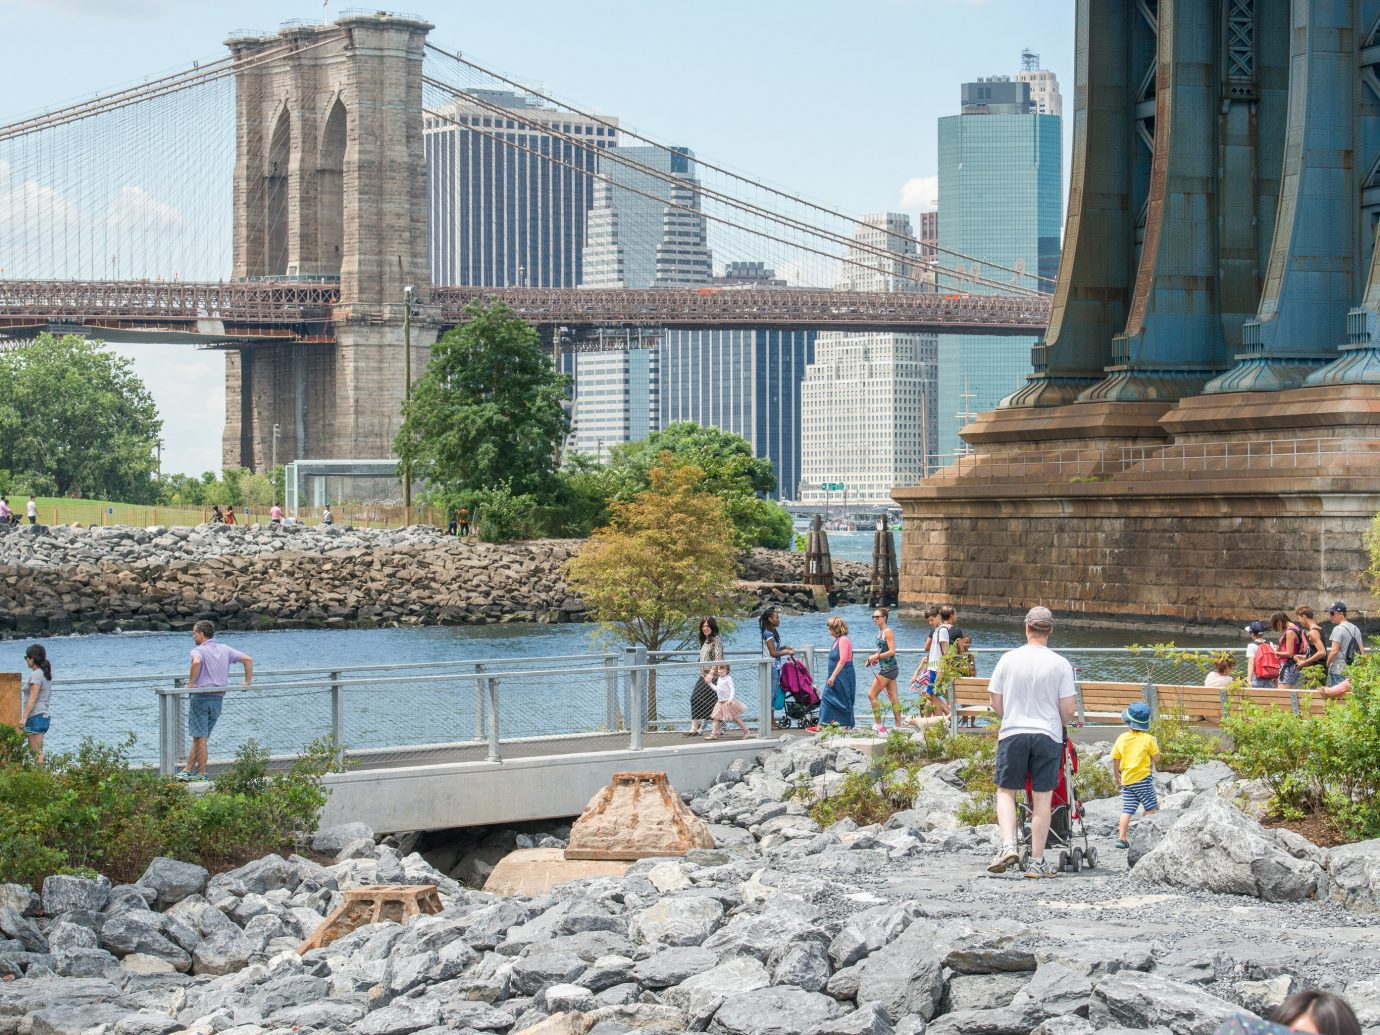 Trip Ideas outdoor sky building landmark vacation tourism people River bridge walkway waterway tours travel